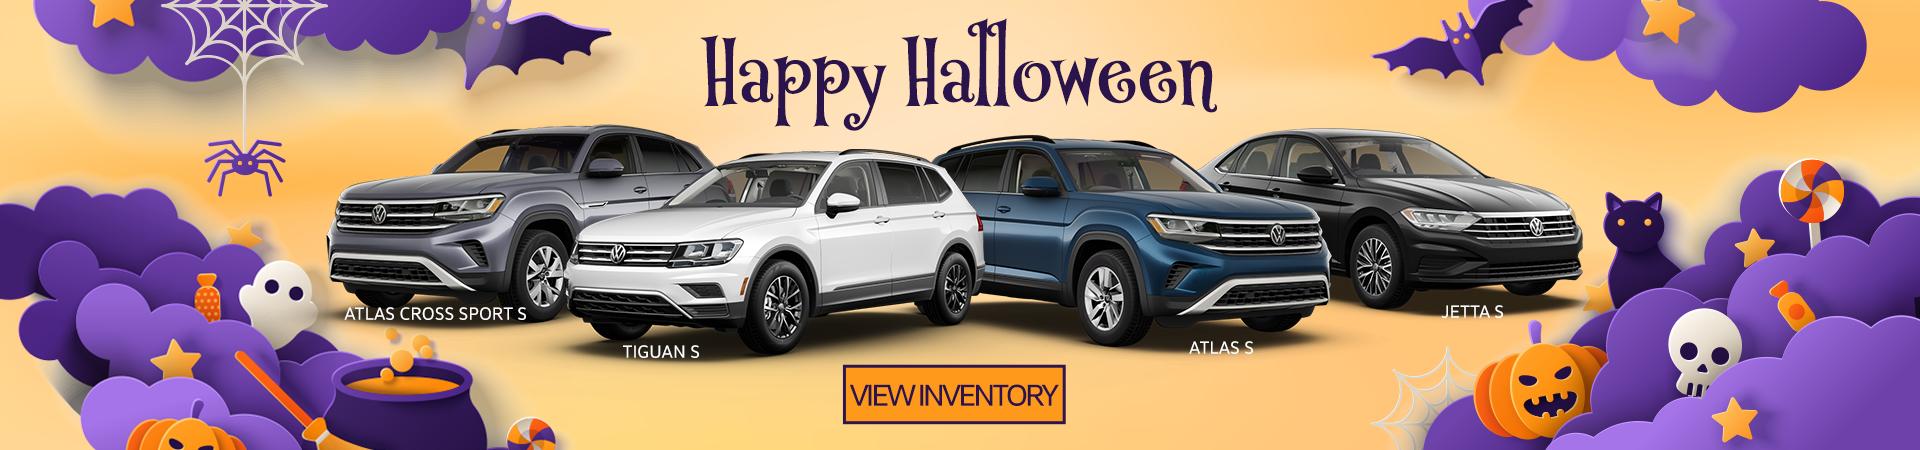 Happy Halloween Inventory Banner